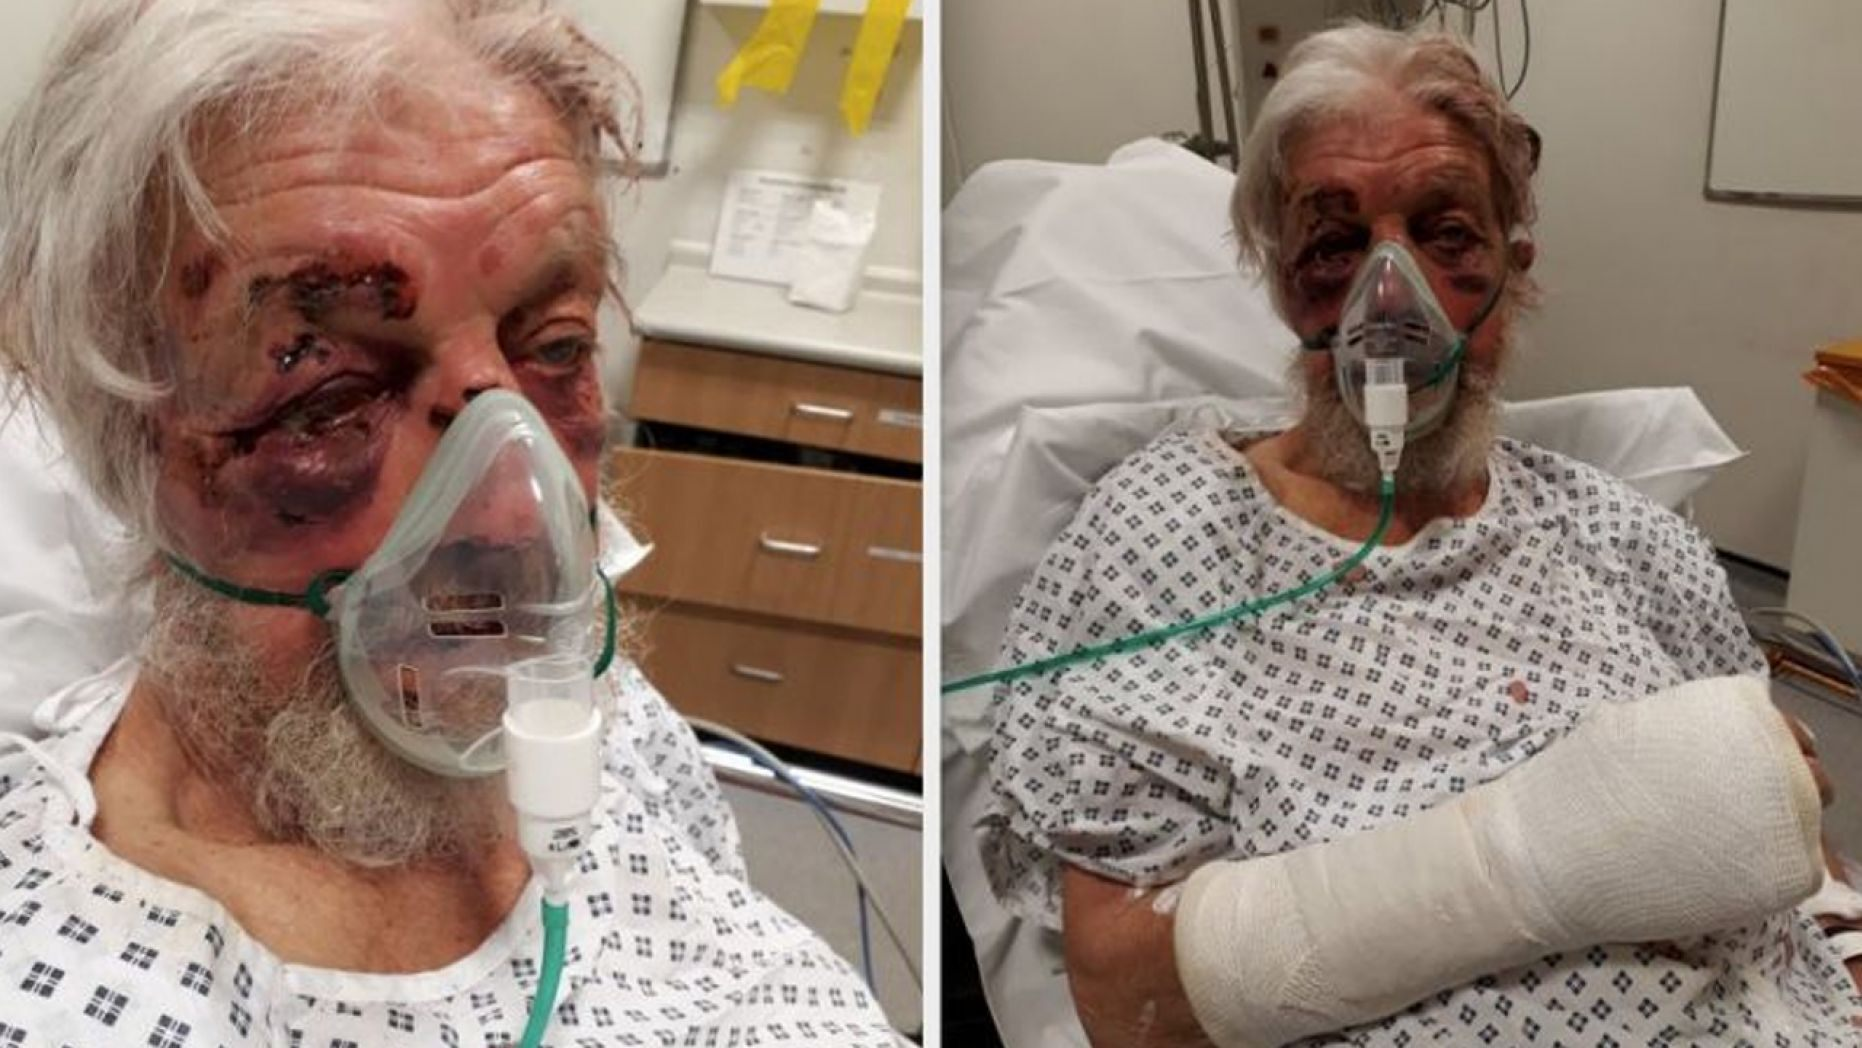 Paul Eva, 80, sustained serious injuries